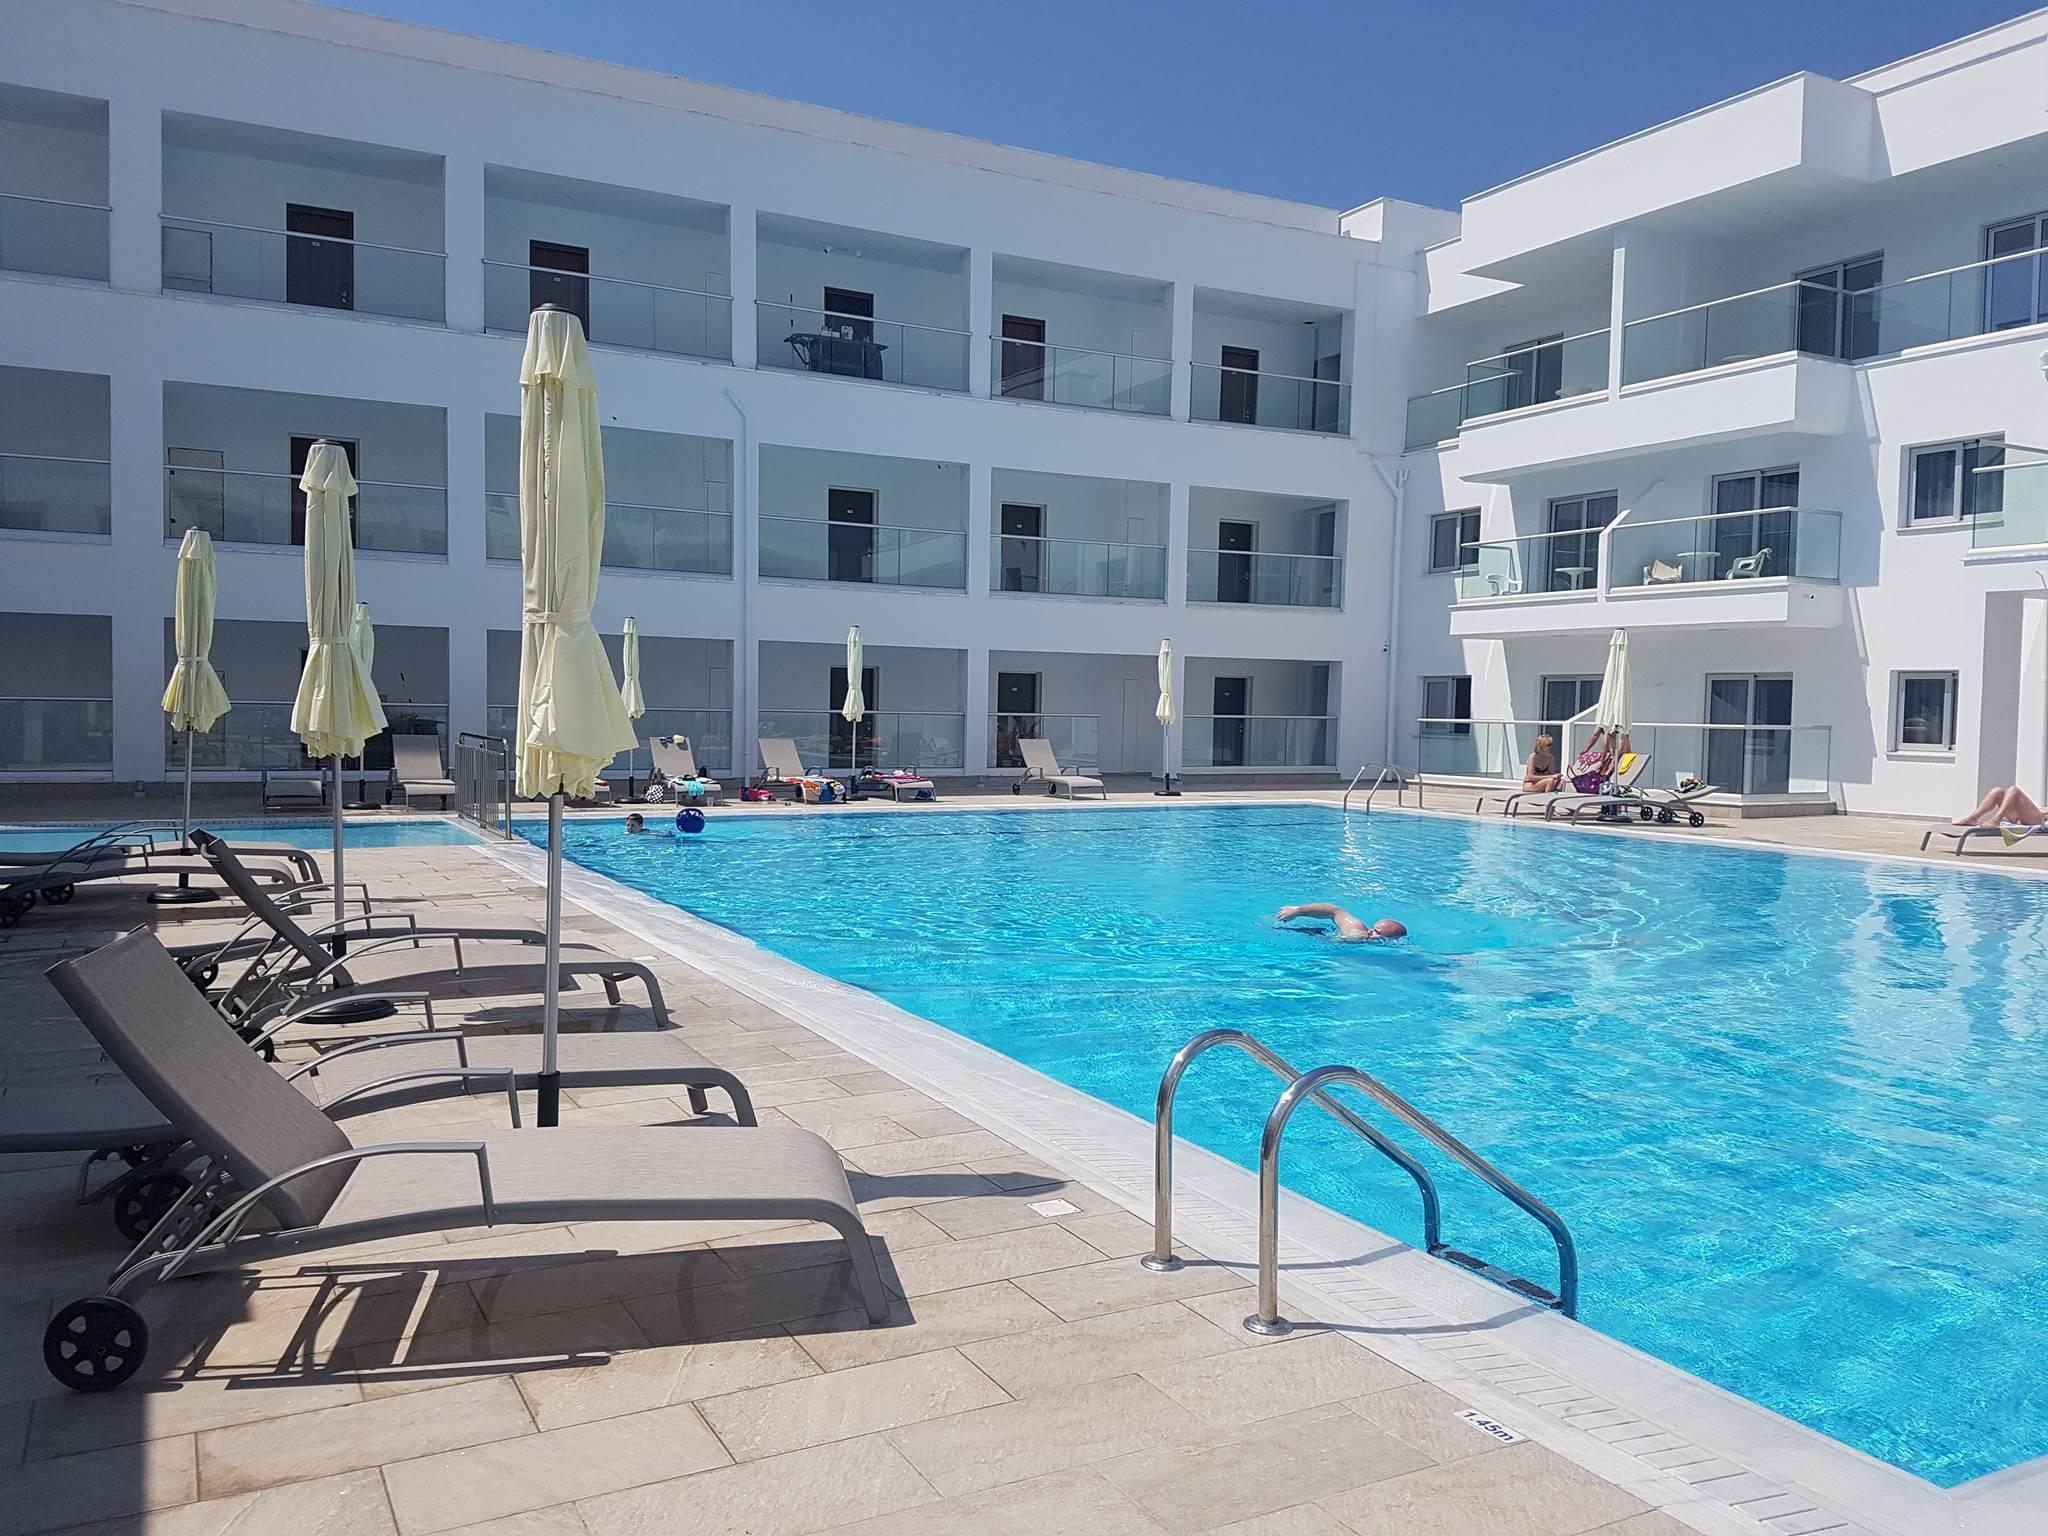 CYPR - LATO 2018: Evabelle Napa Hotel Apartments***, 15 dni (16-30.07.2018 r.), bez wyżywienia: 2 + 2